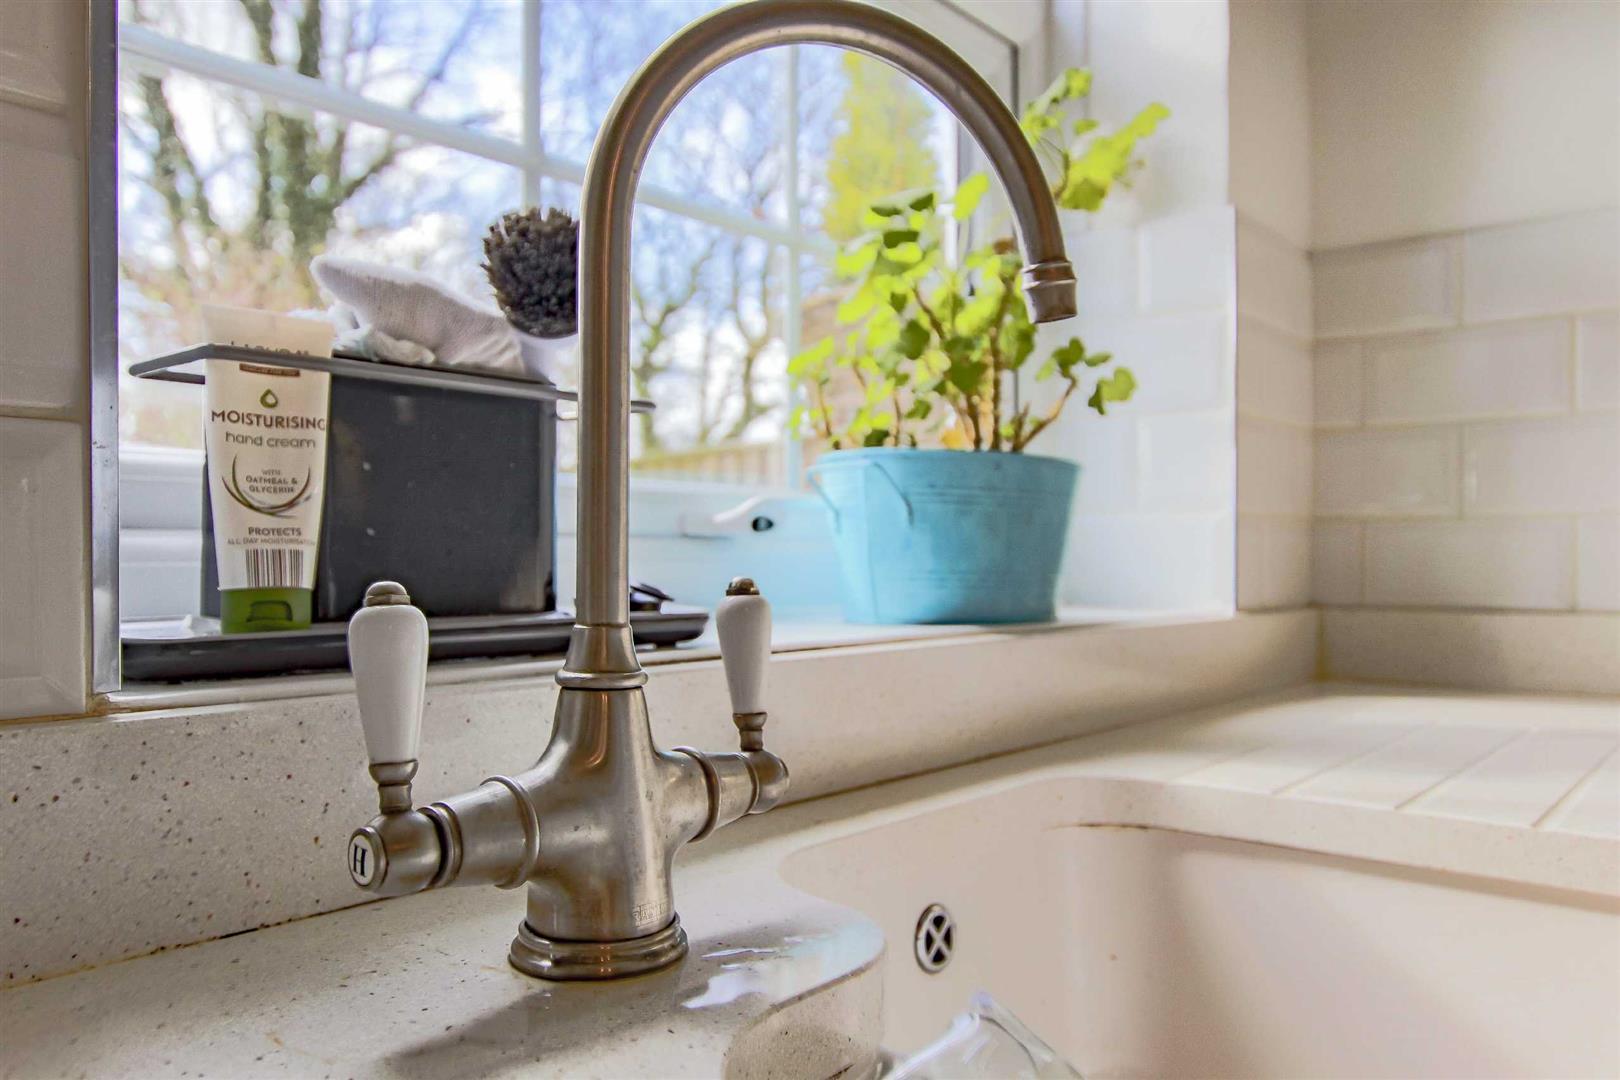 4 Bedroom Detached House For Sale - p033686_33.jpg